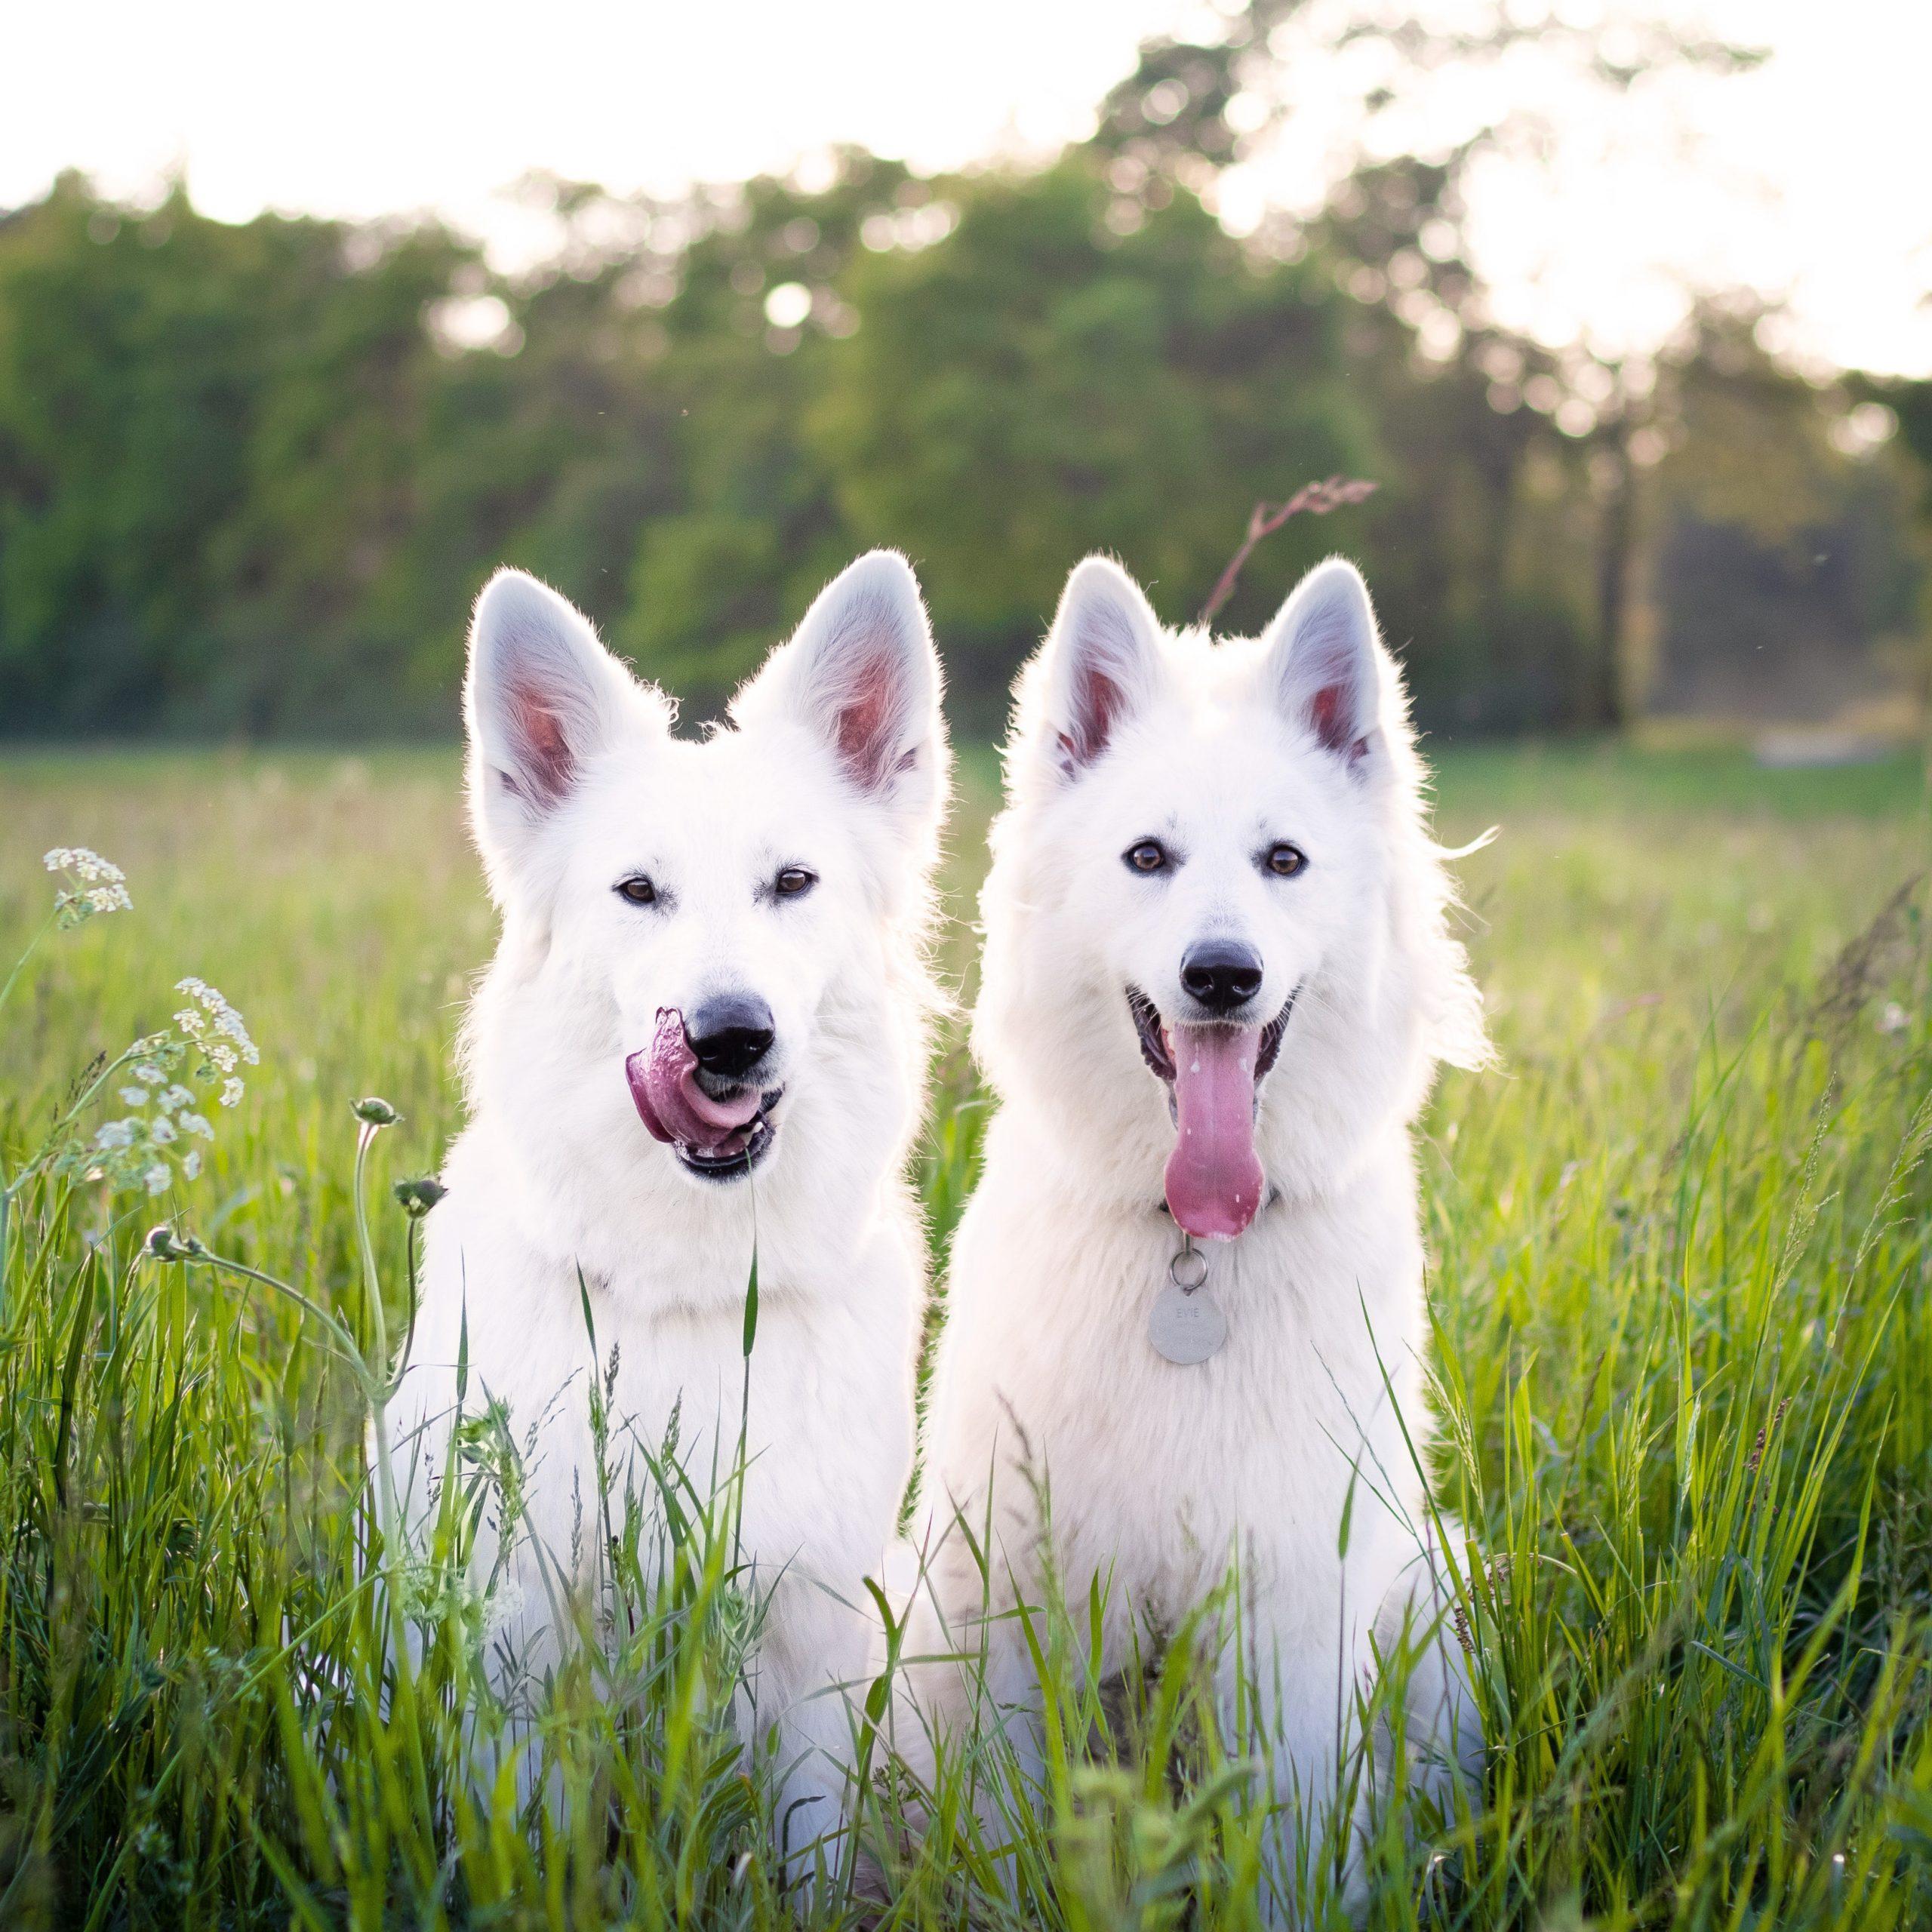 120+ White Fluffy Dog Names - dog name ideas, white dog breeds, puppy names, white dog names, fluffy dog names